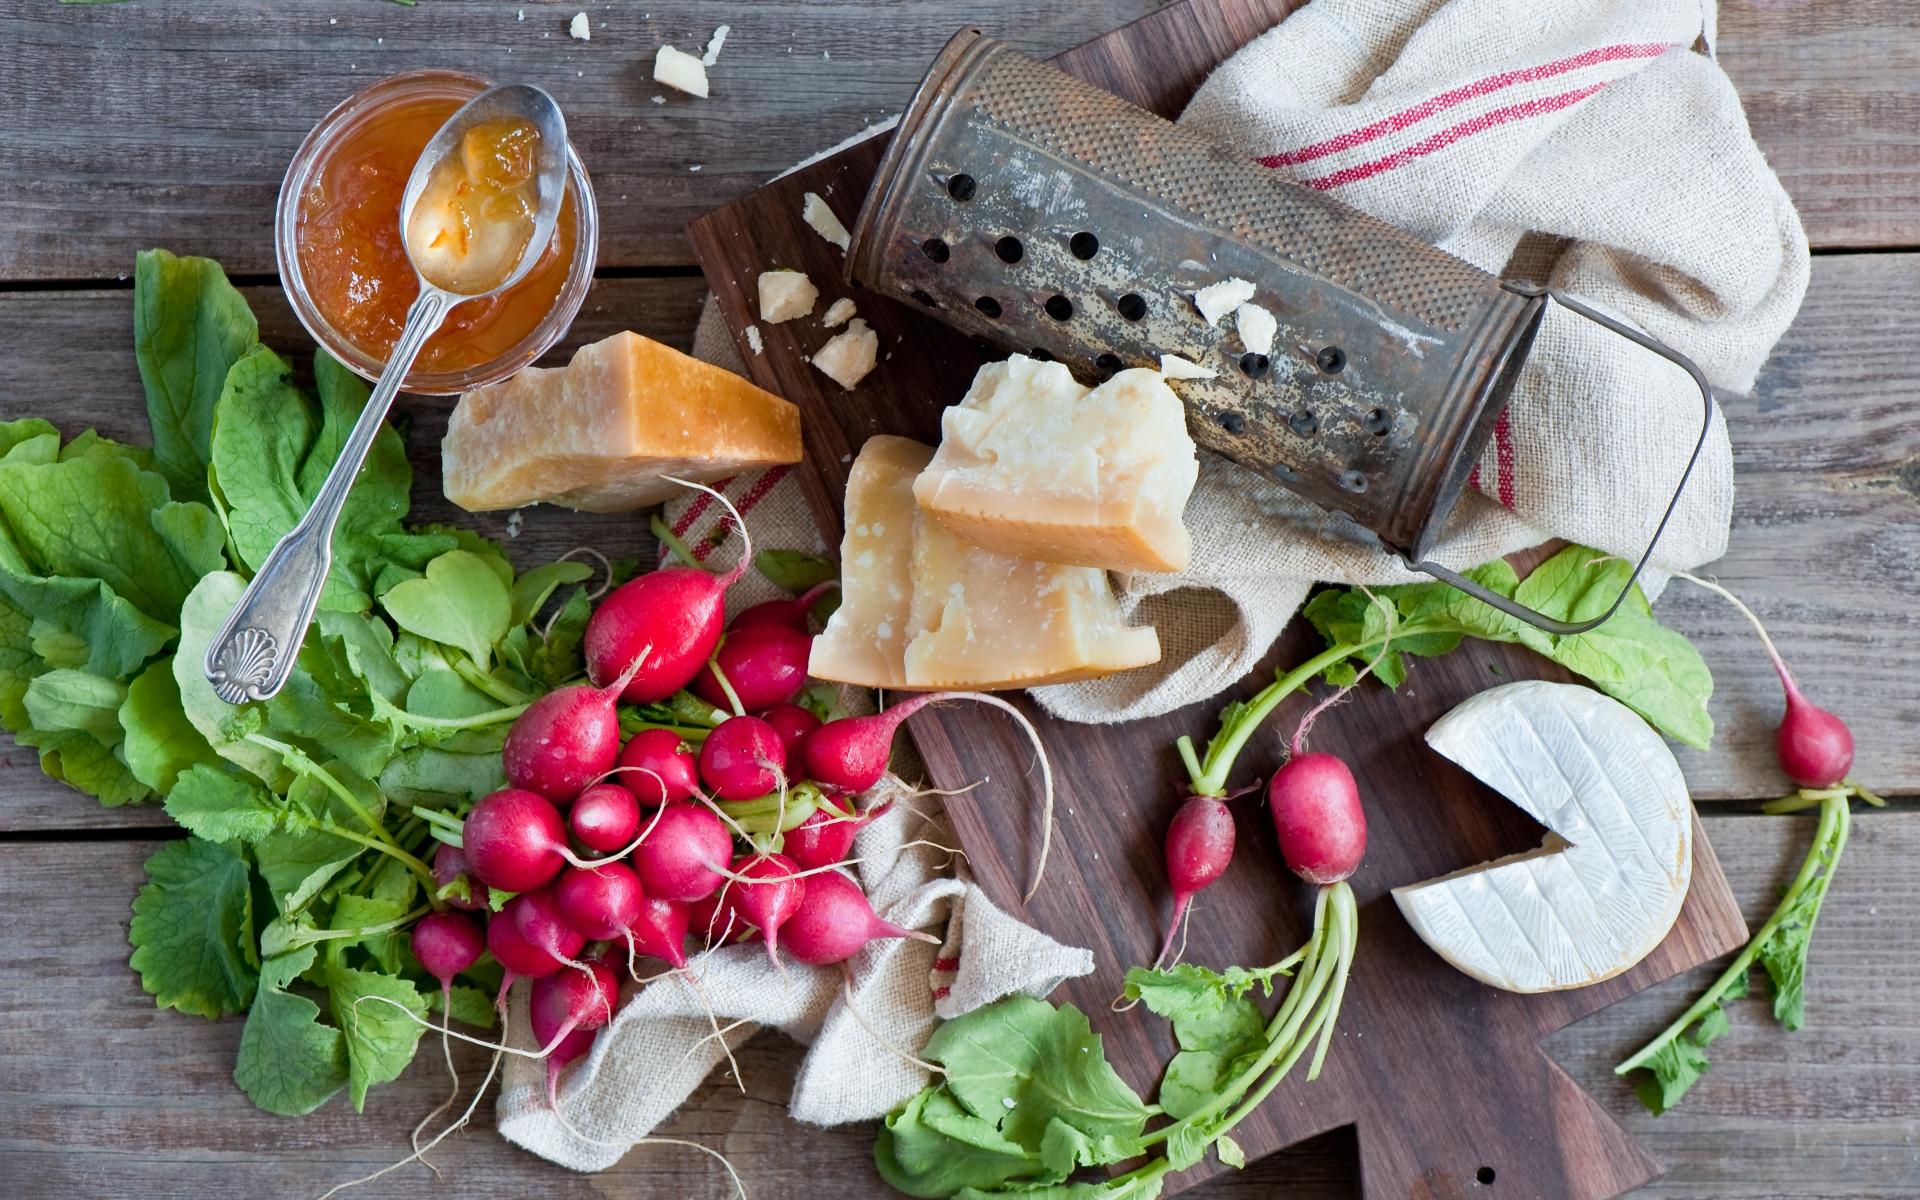 Картинки сыр, редька, мед, овощи, варенье, натюрморт фото и обои на рабочий стол